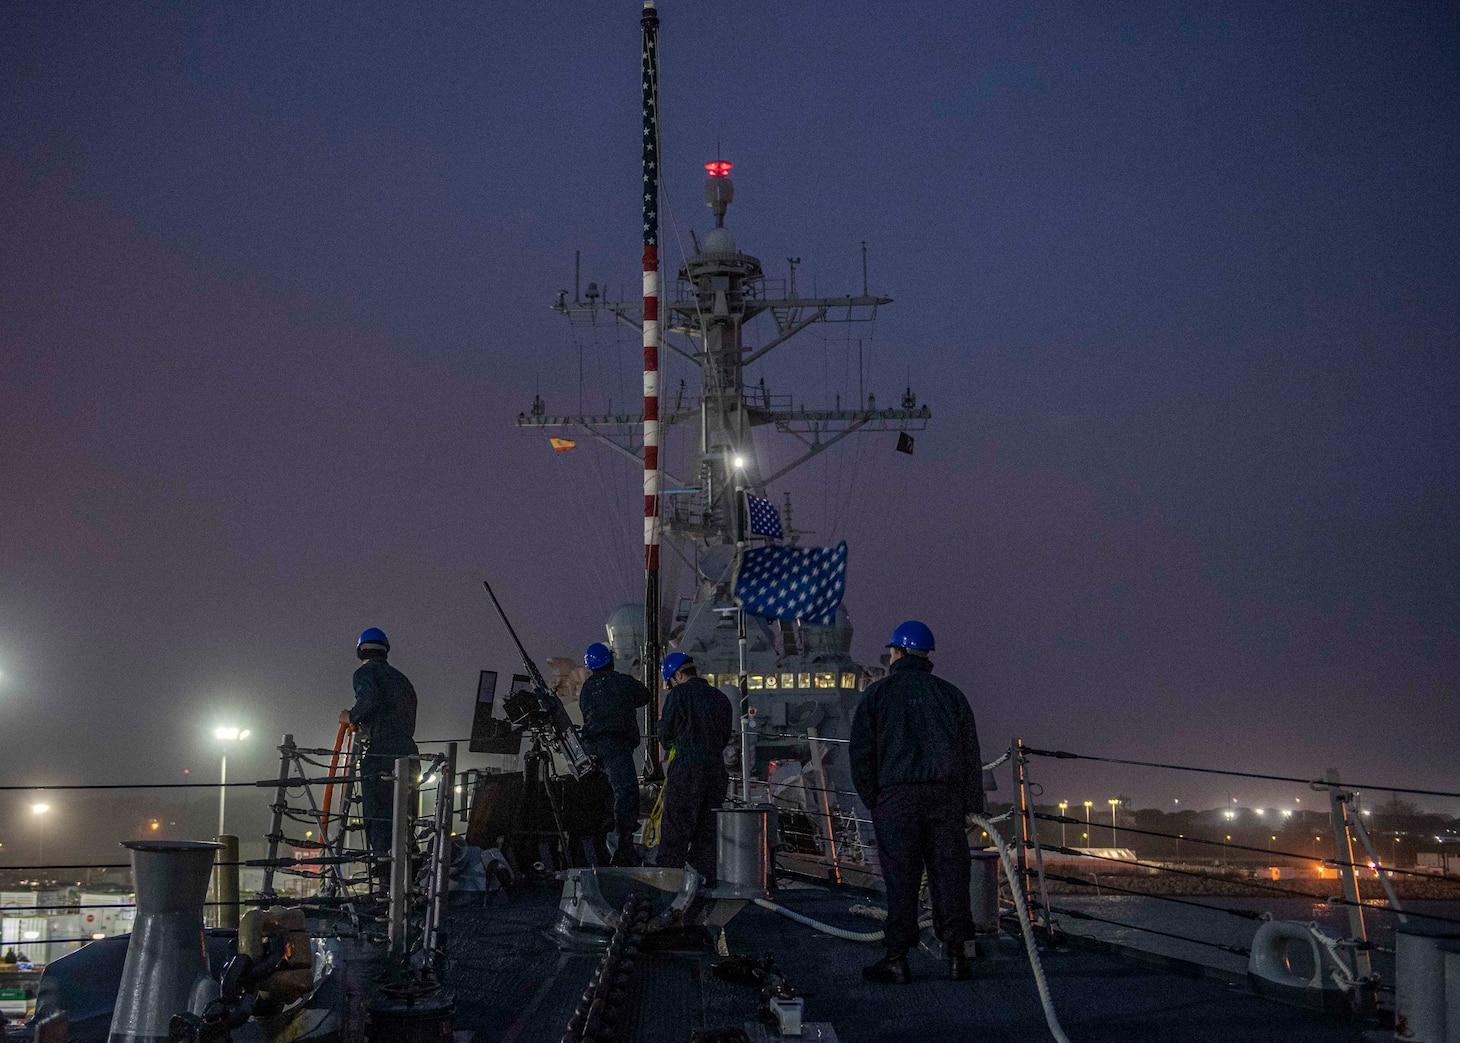 Rota, Spain; USS Carney (DDG 64)